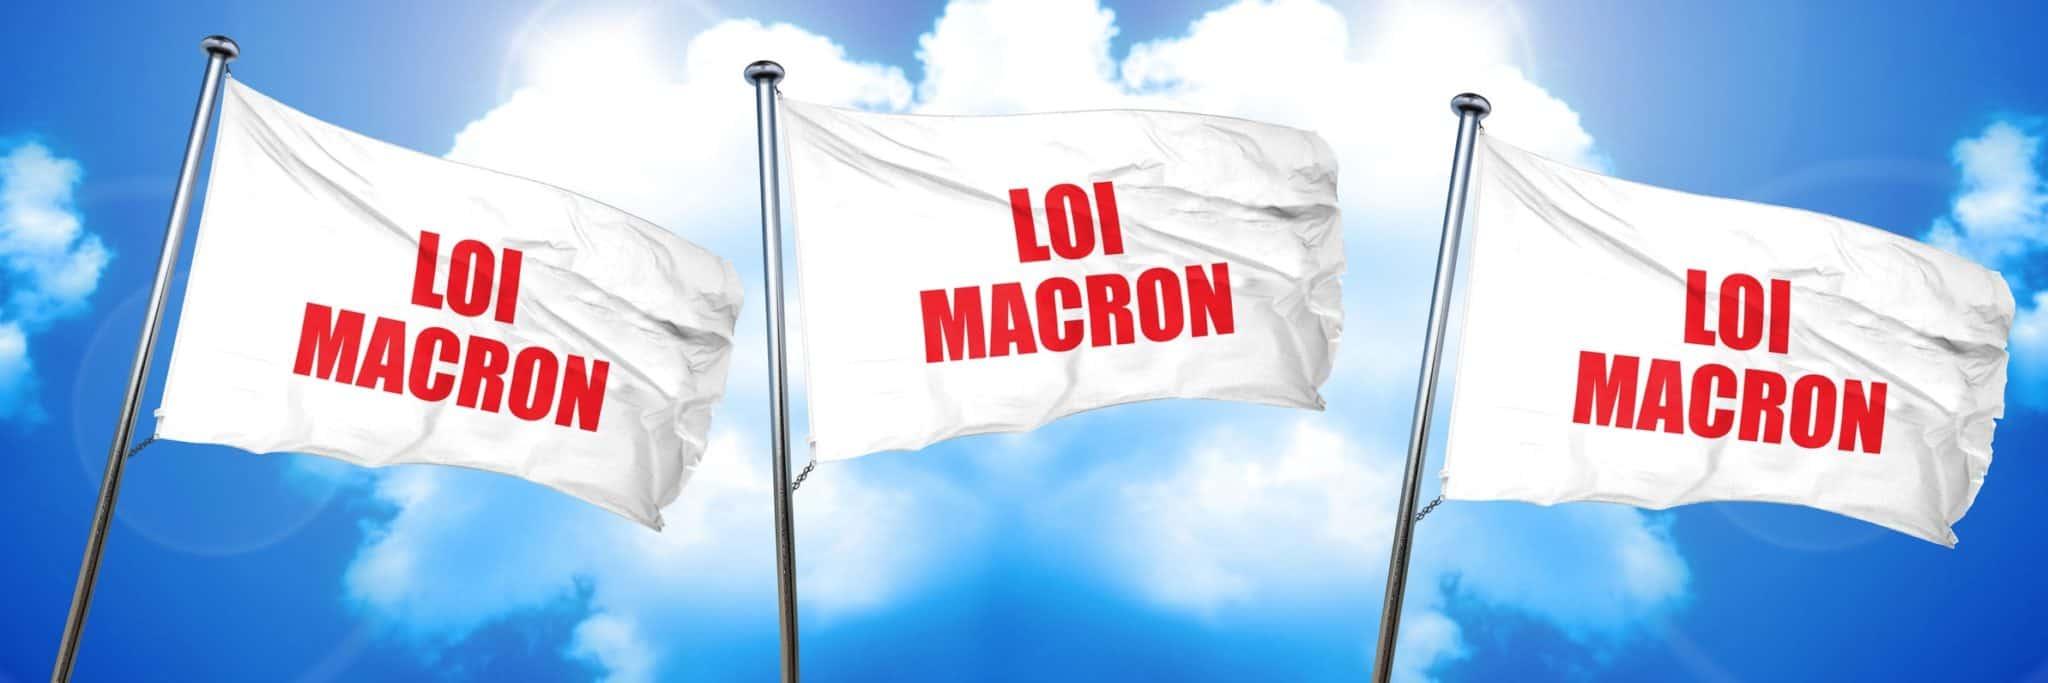 Loi Macron 2015 Que Savoir